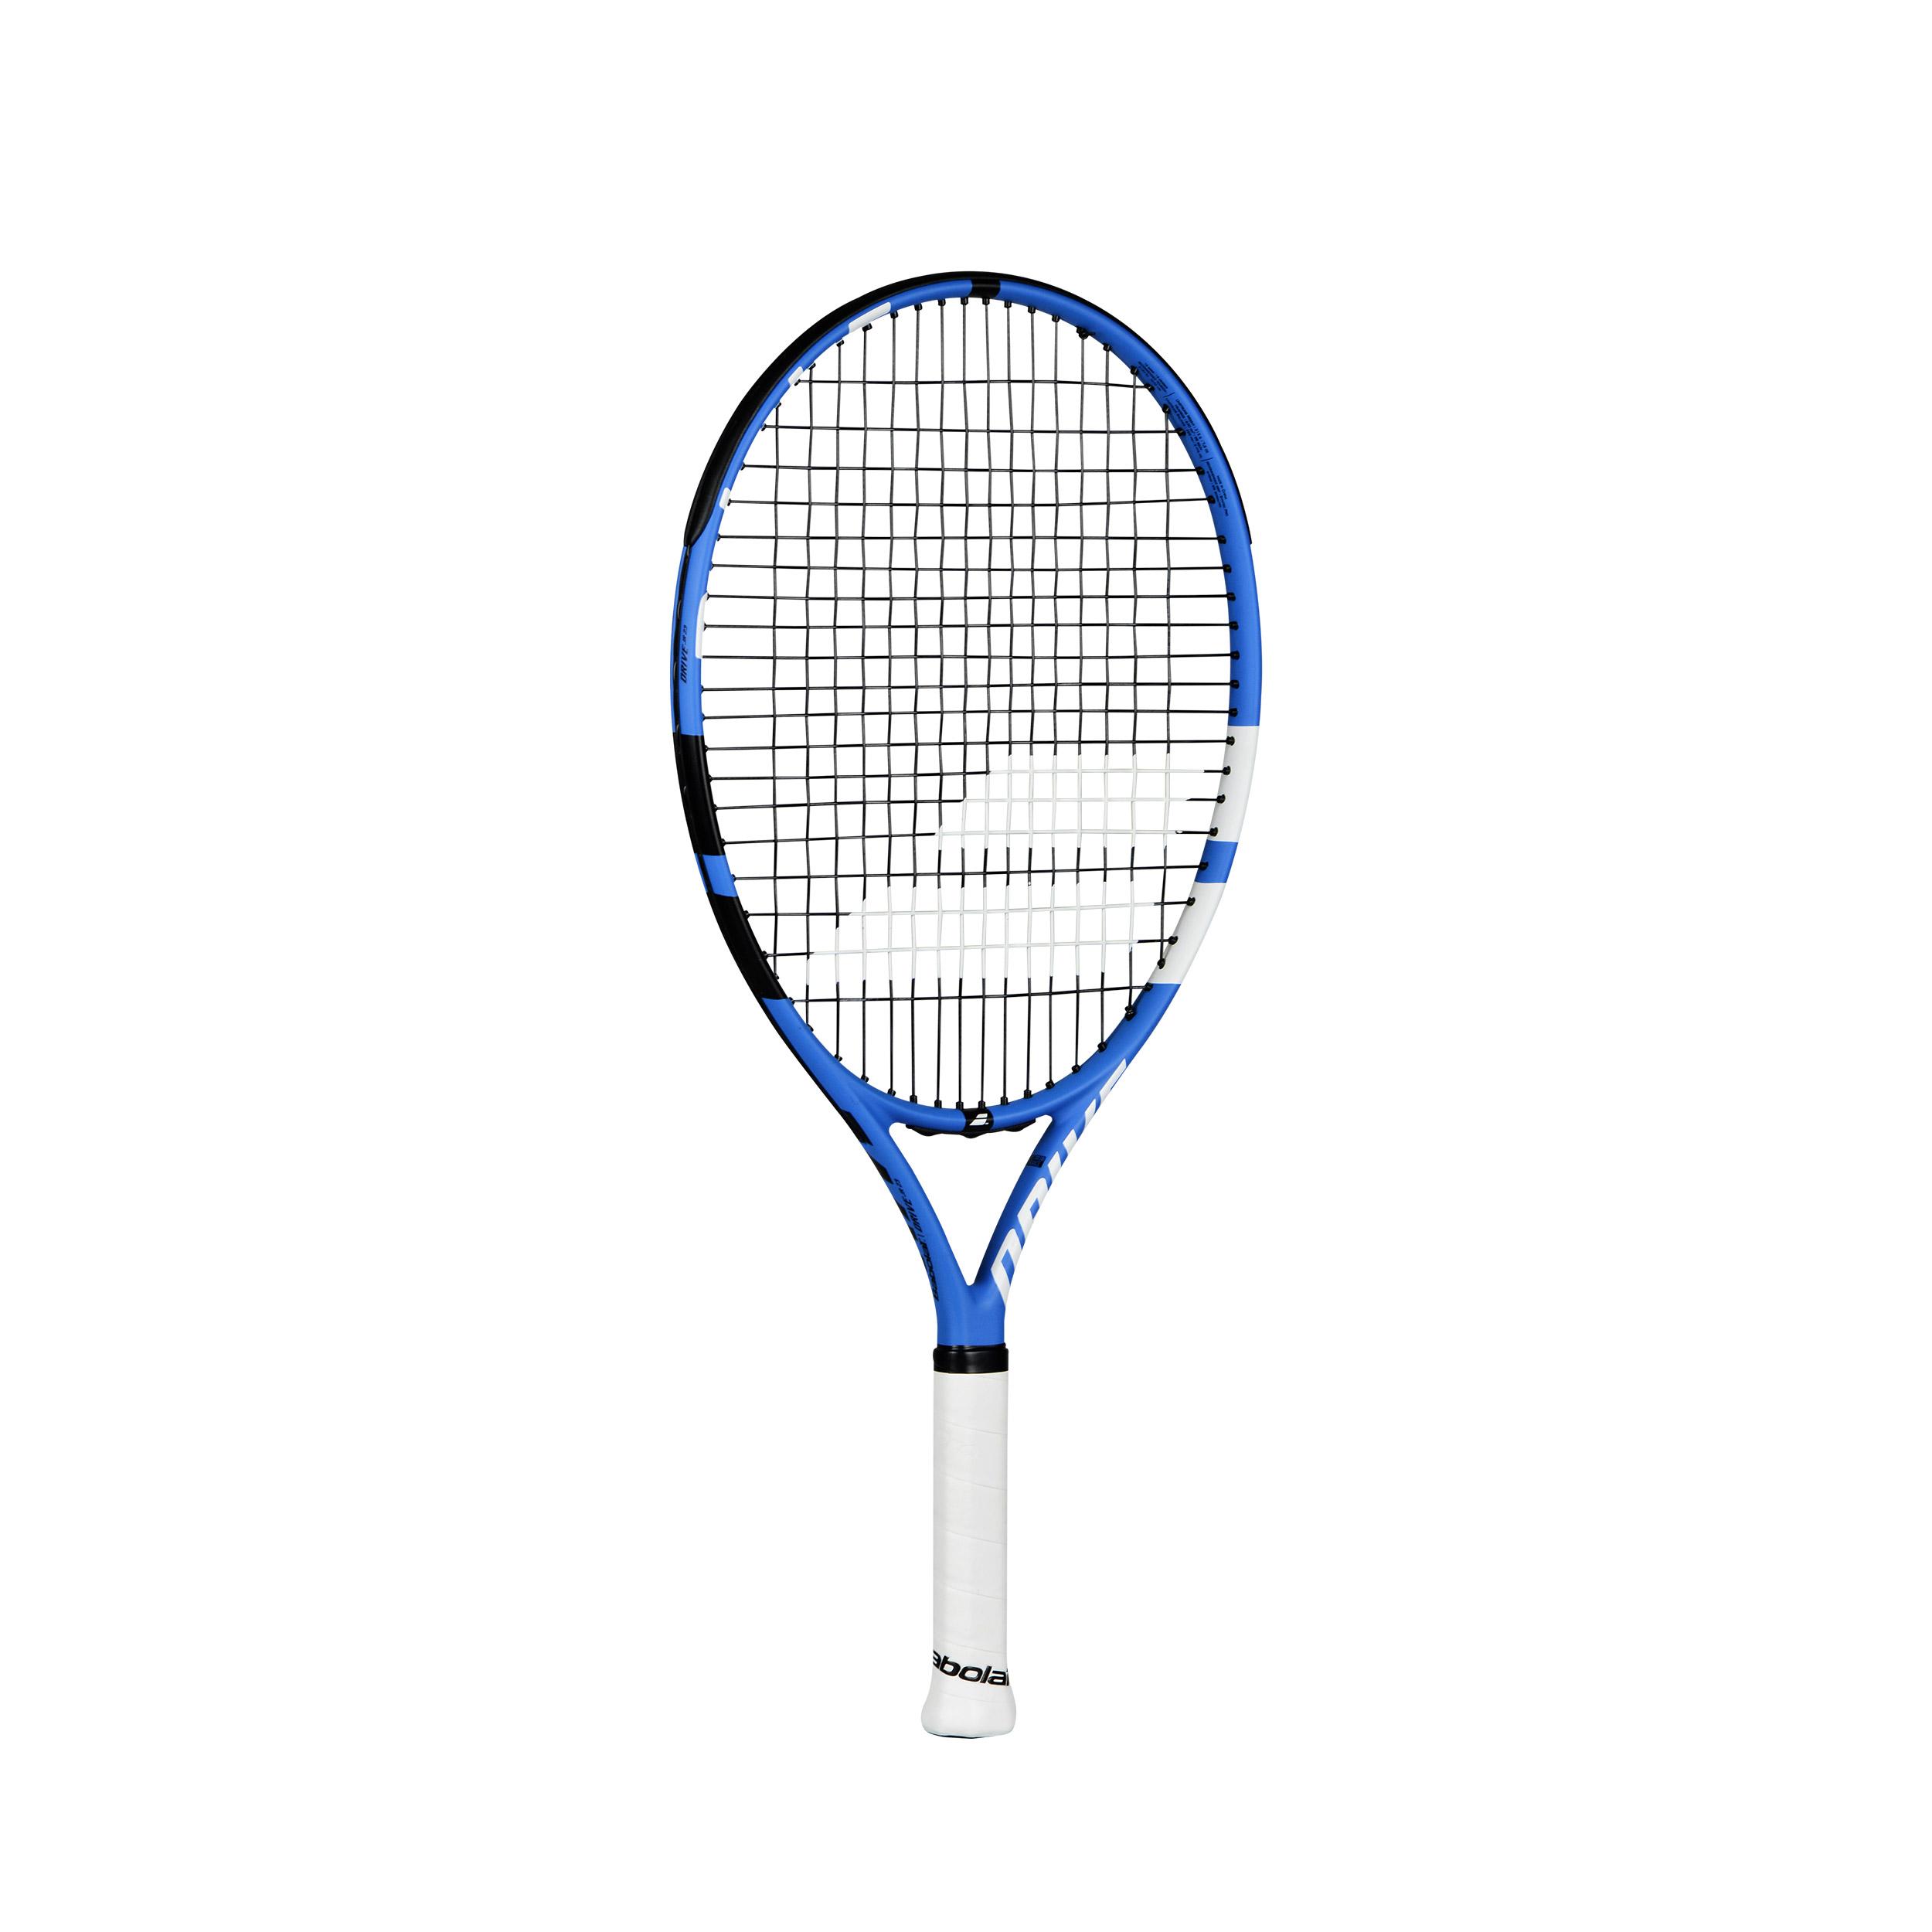 Babolat Drive junior 23 besaitet 215g raqueta de tenis azul-blancoo 000 nuevo